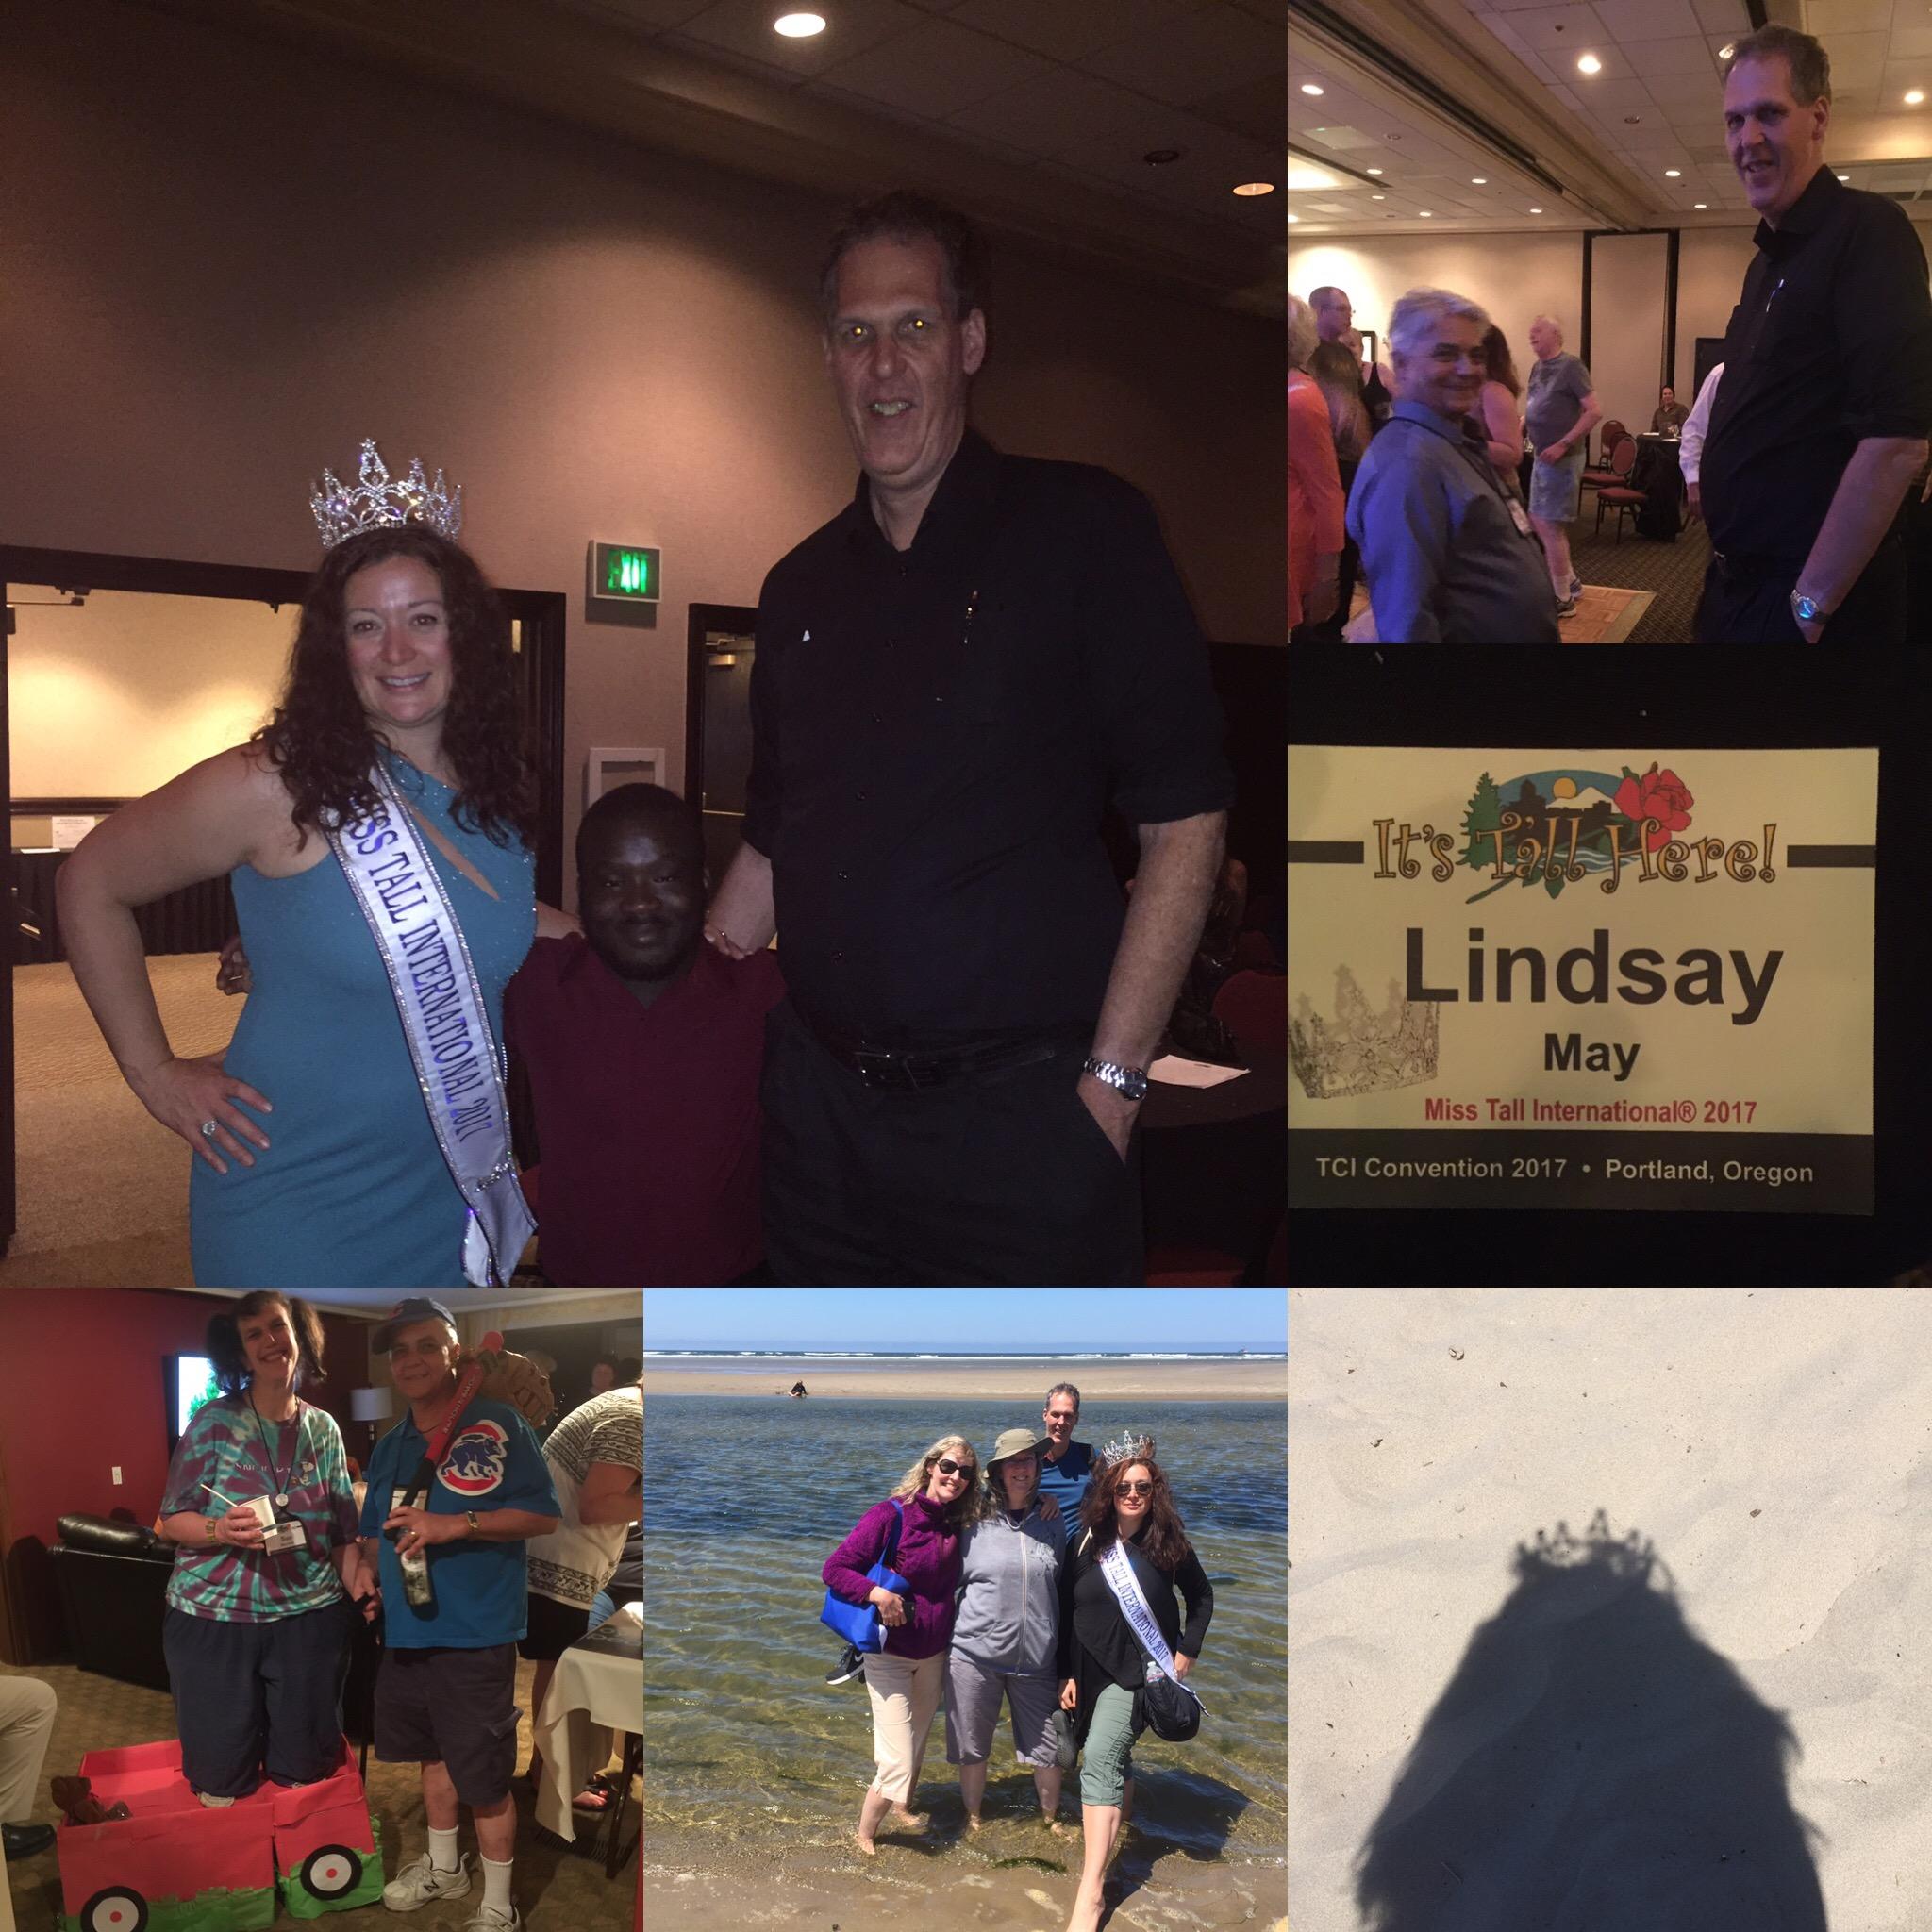 Tall Club Convention 2017 where Lindsay May won Miss TI